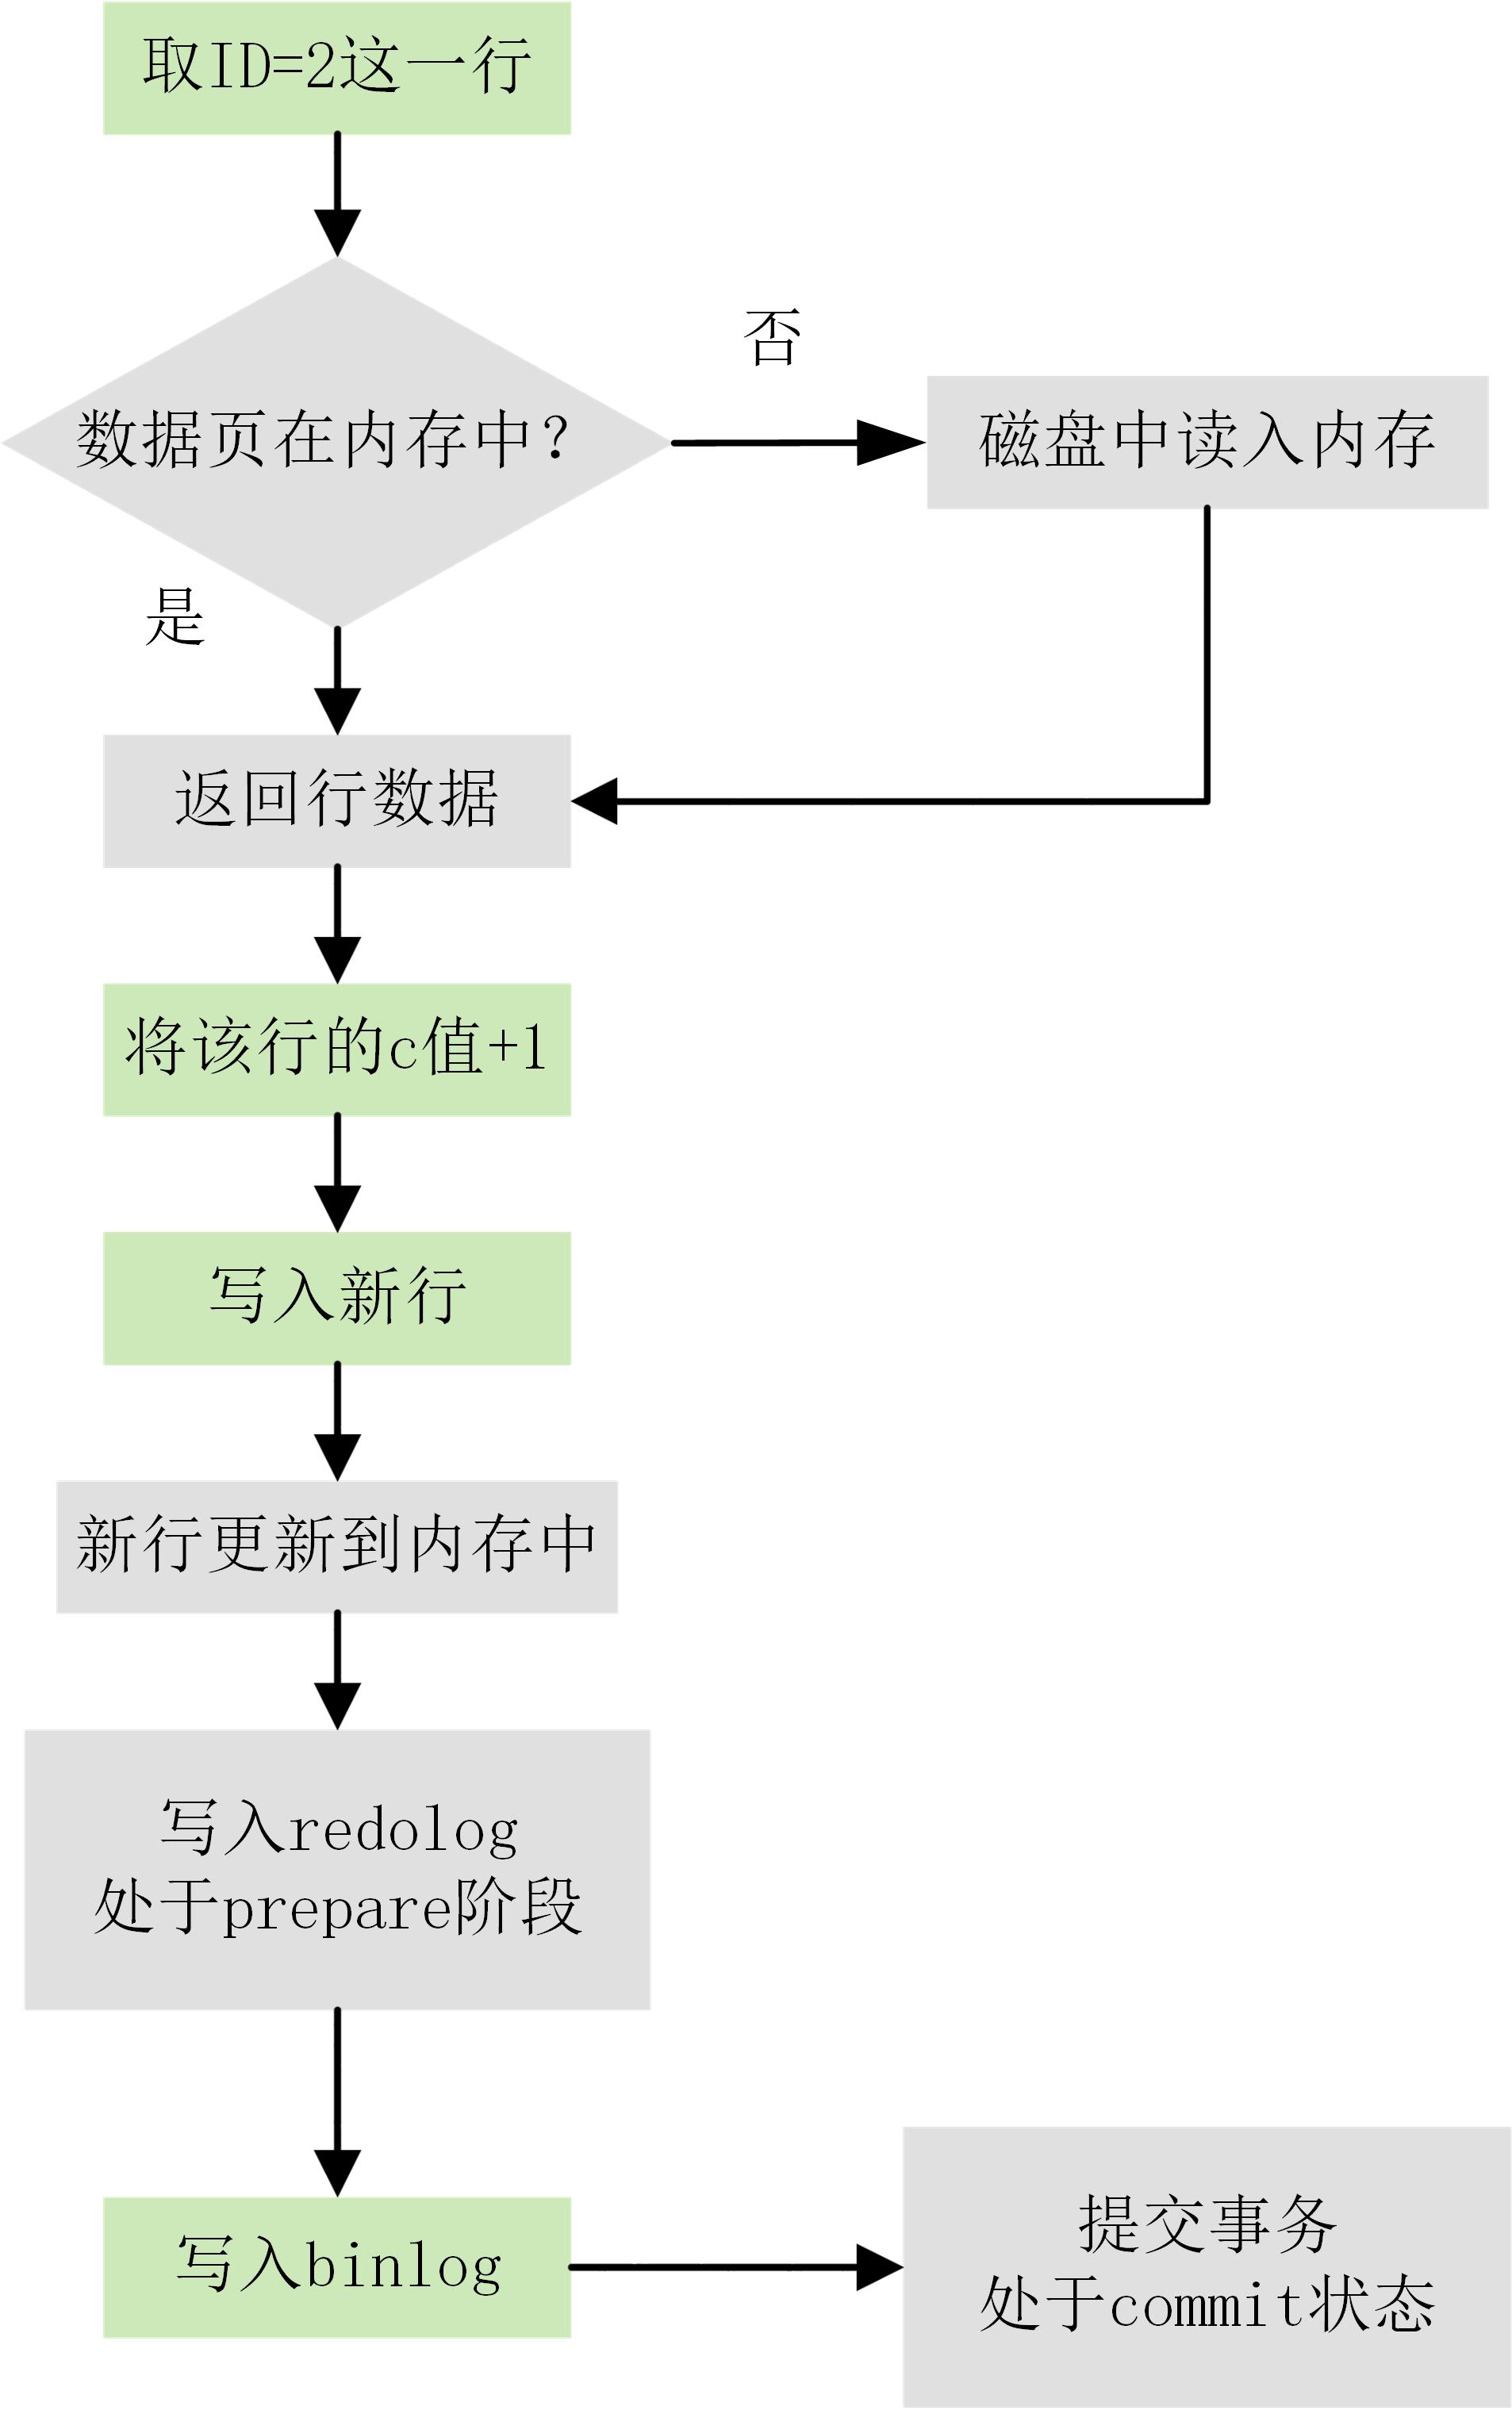 update语句执行流程